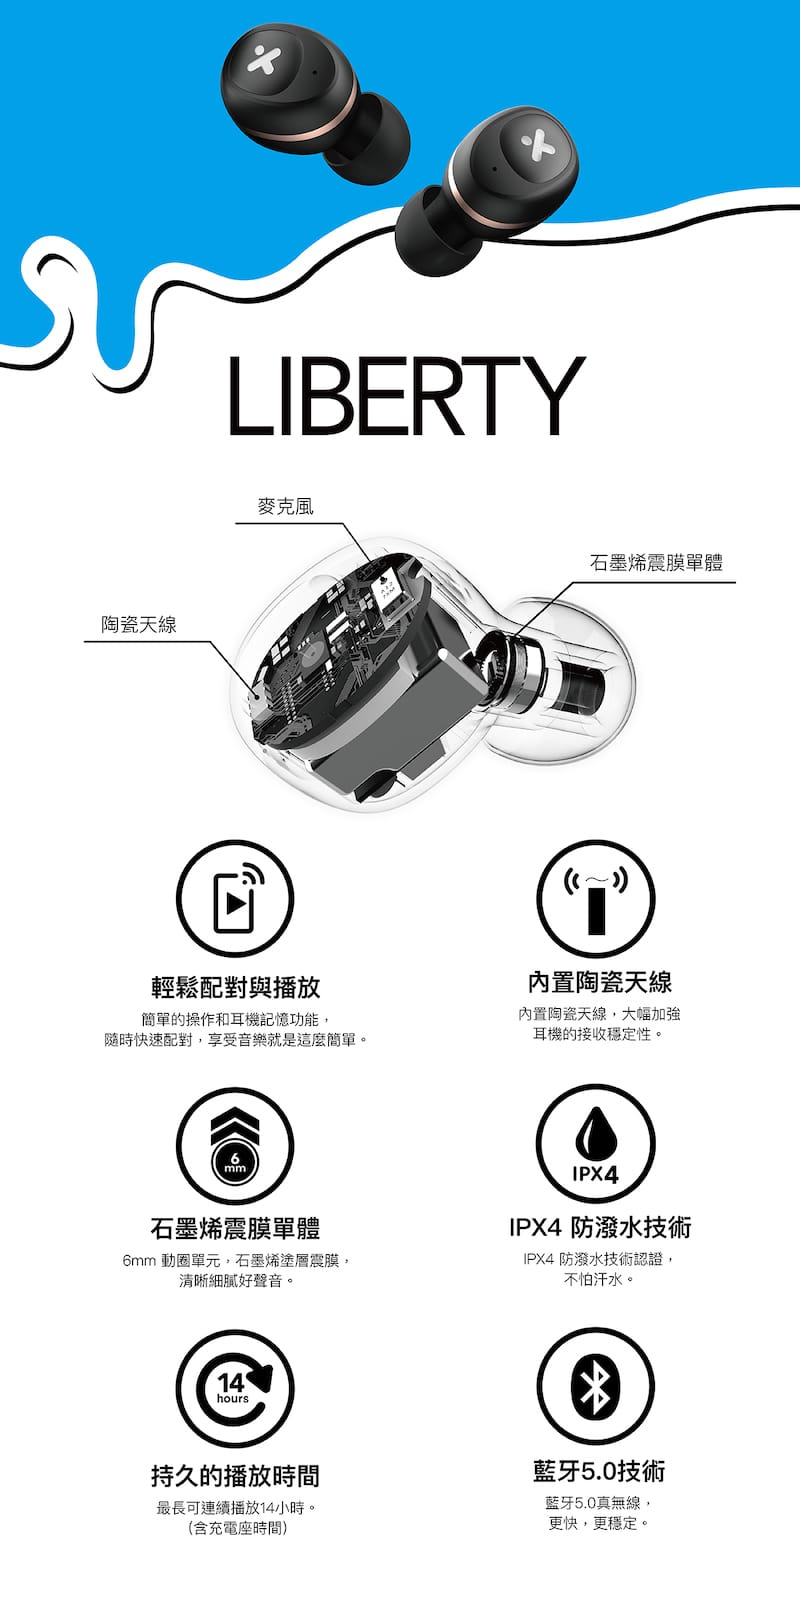 X-mini Liberty 真無線藍牙耳機